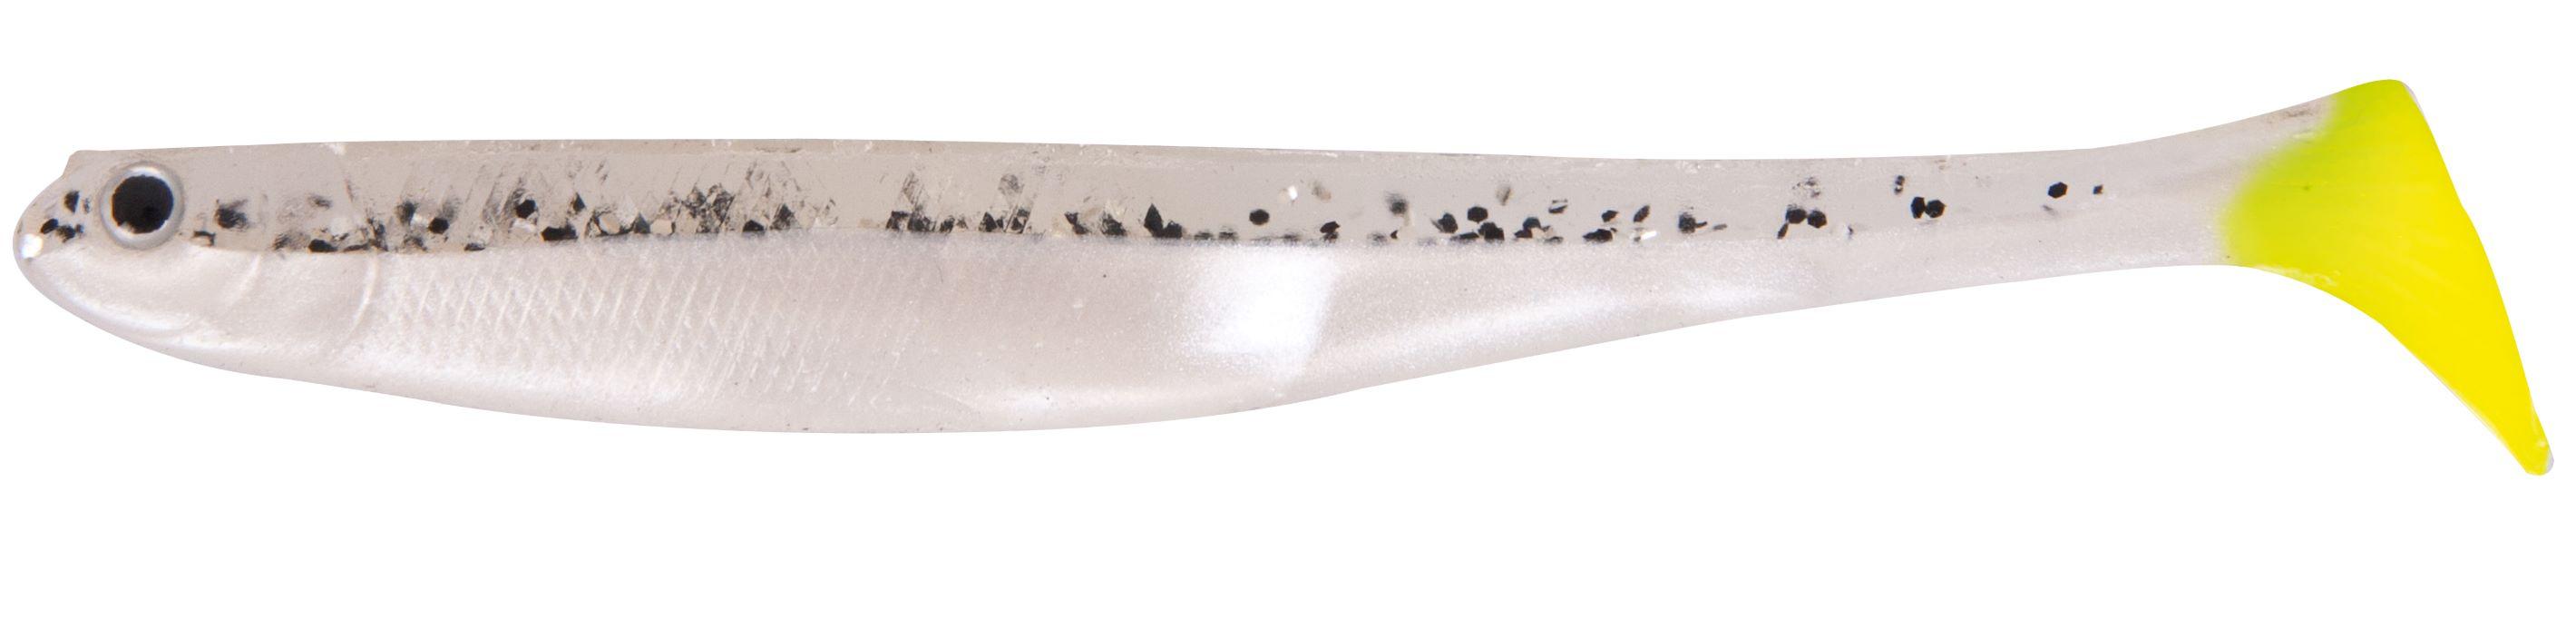 Iron Claw gumová nástraha Slim Jim 7 cm Vzor CT, 3ks